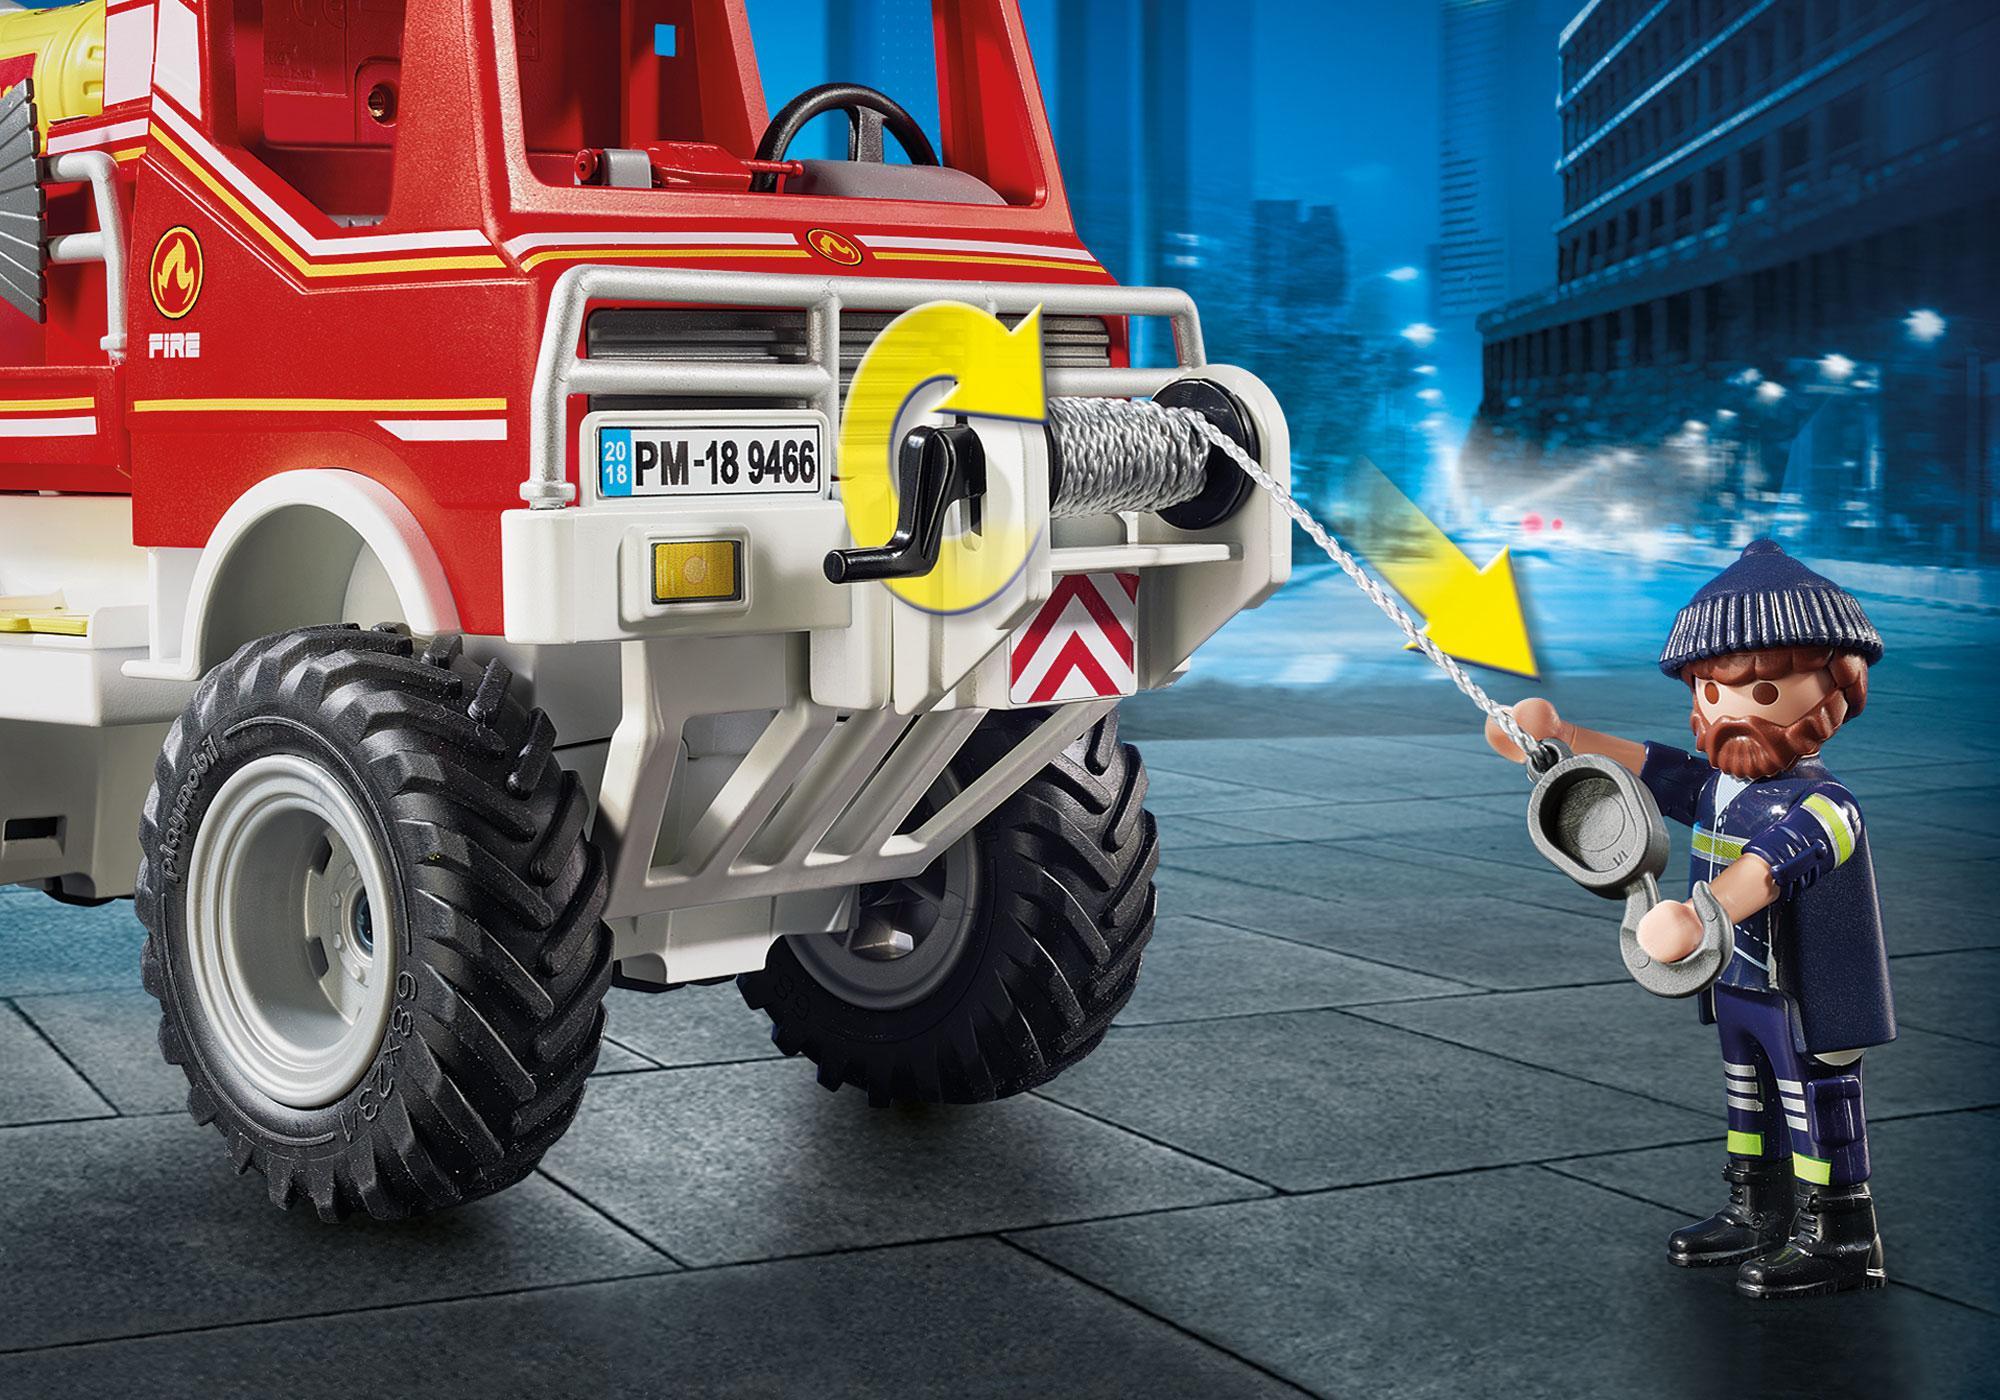 http://media.playmobil.com/i/playmobil/9466_product_extra1/Feuerwehr-Truck